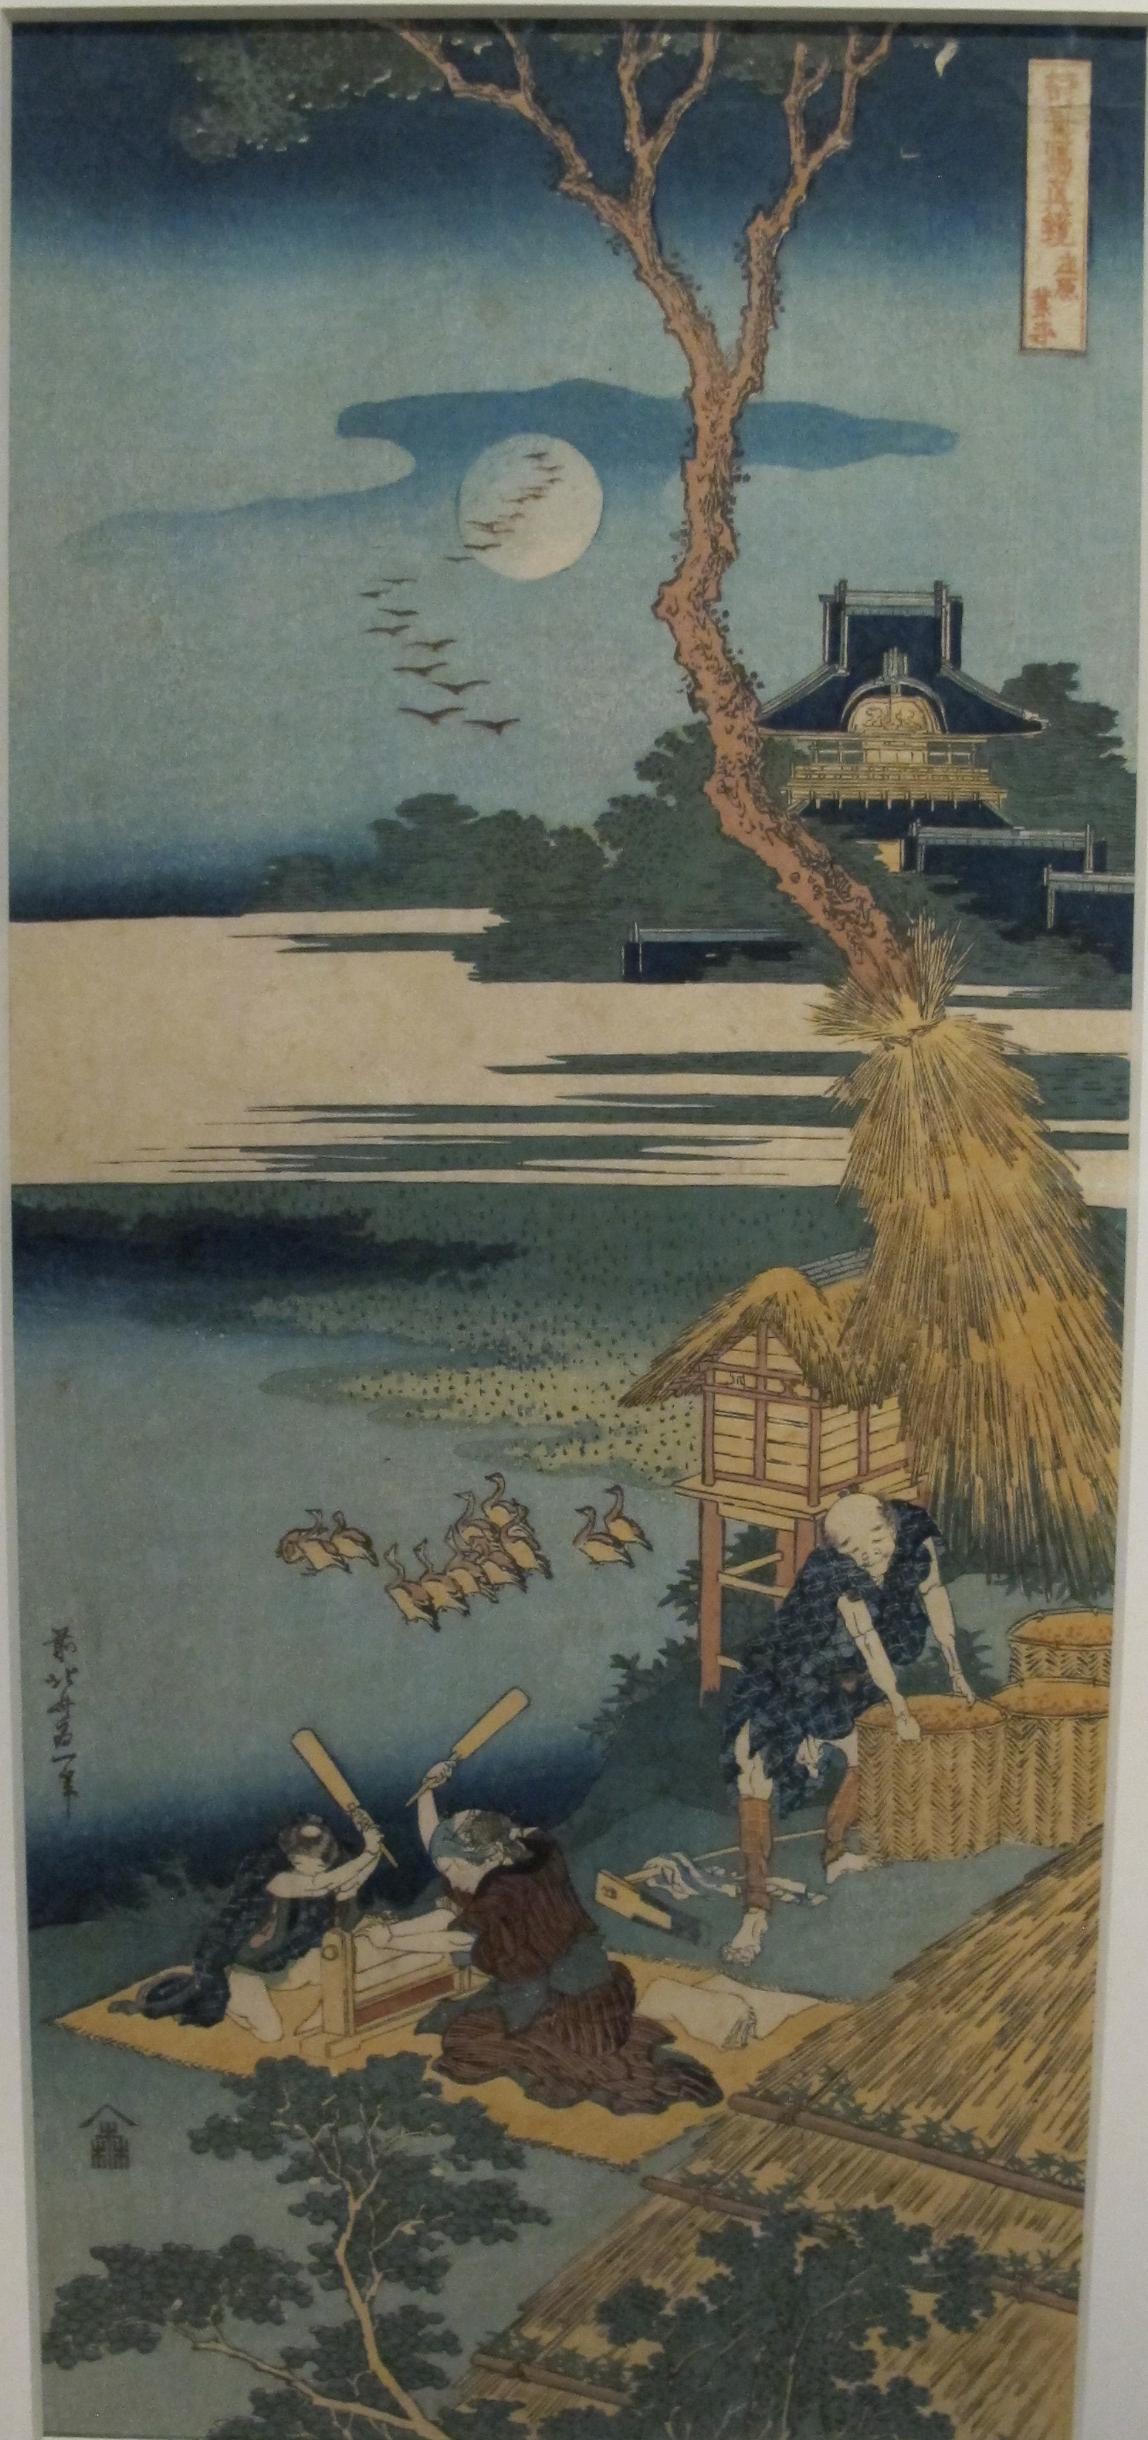 https://i0.wp.com/upload.wikimedia.org/wikipedia/commons/3/33/Katsushika_hokusai%2C_illustrazione_di_poemi_famosi_-_ariwara_no_narihira%2C_XIX_sec.JPG